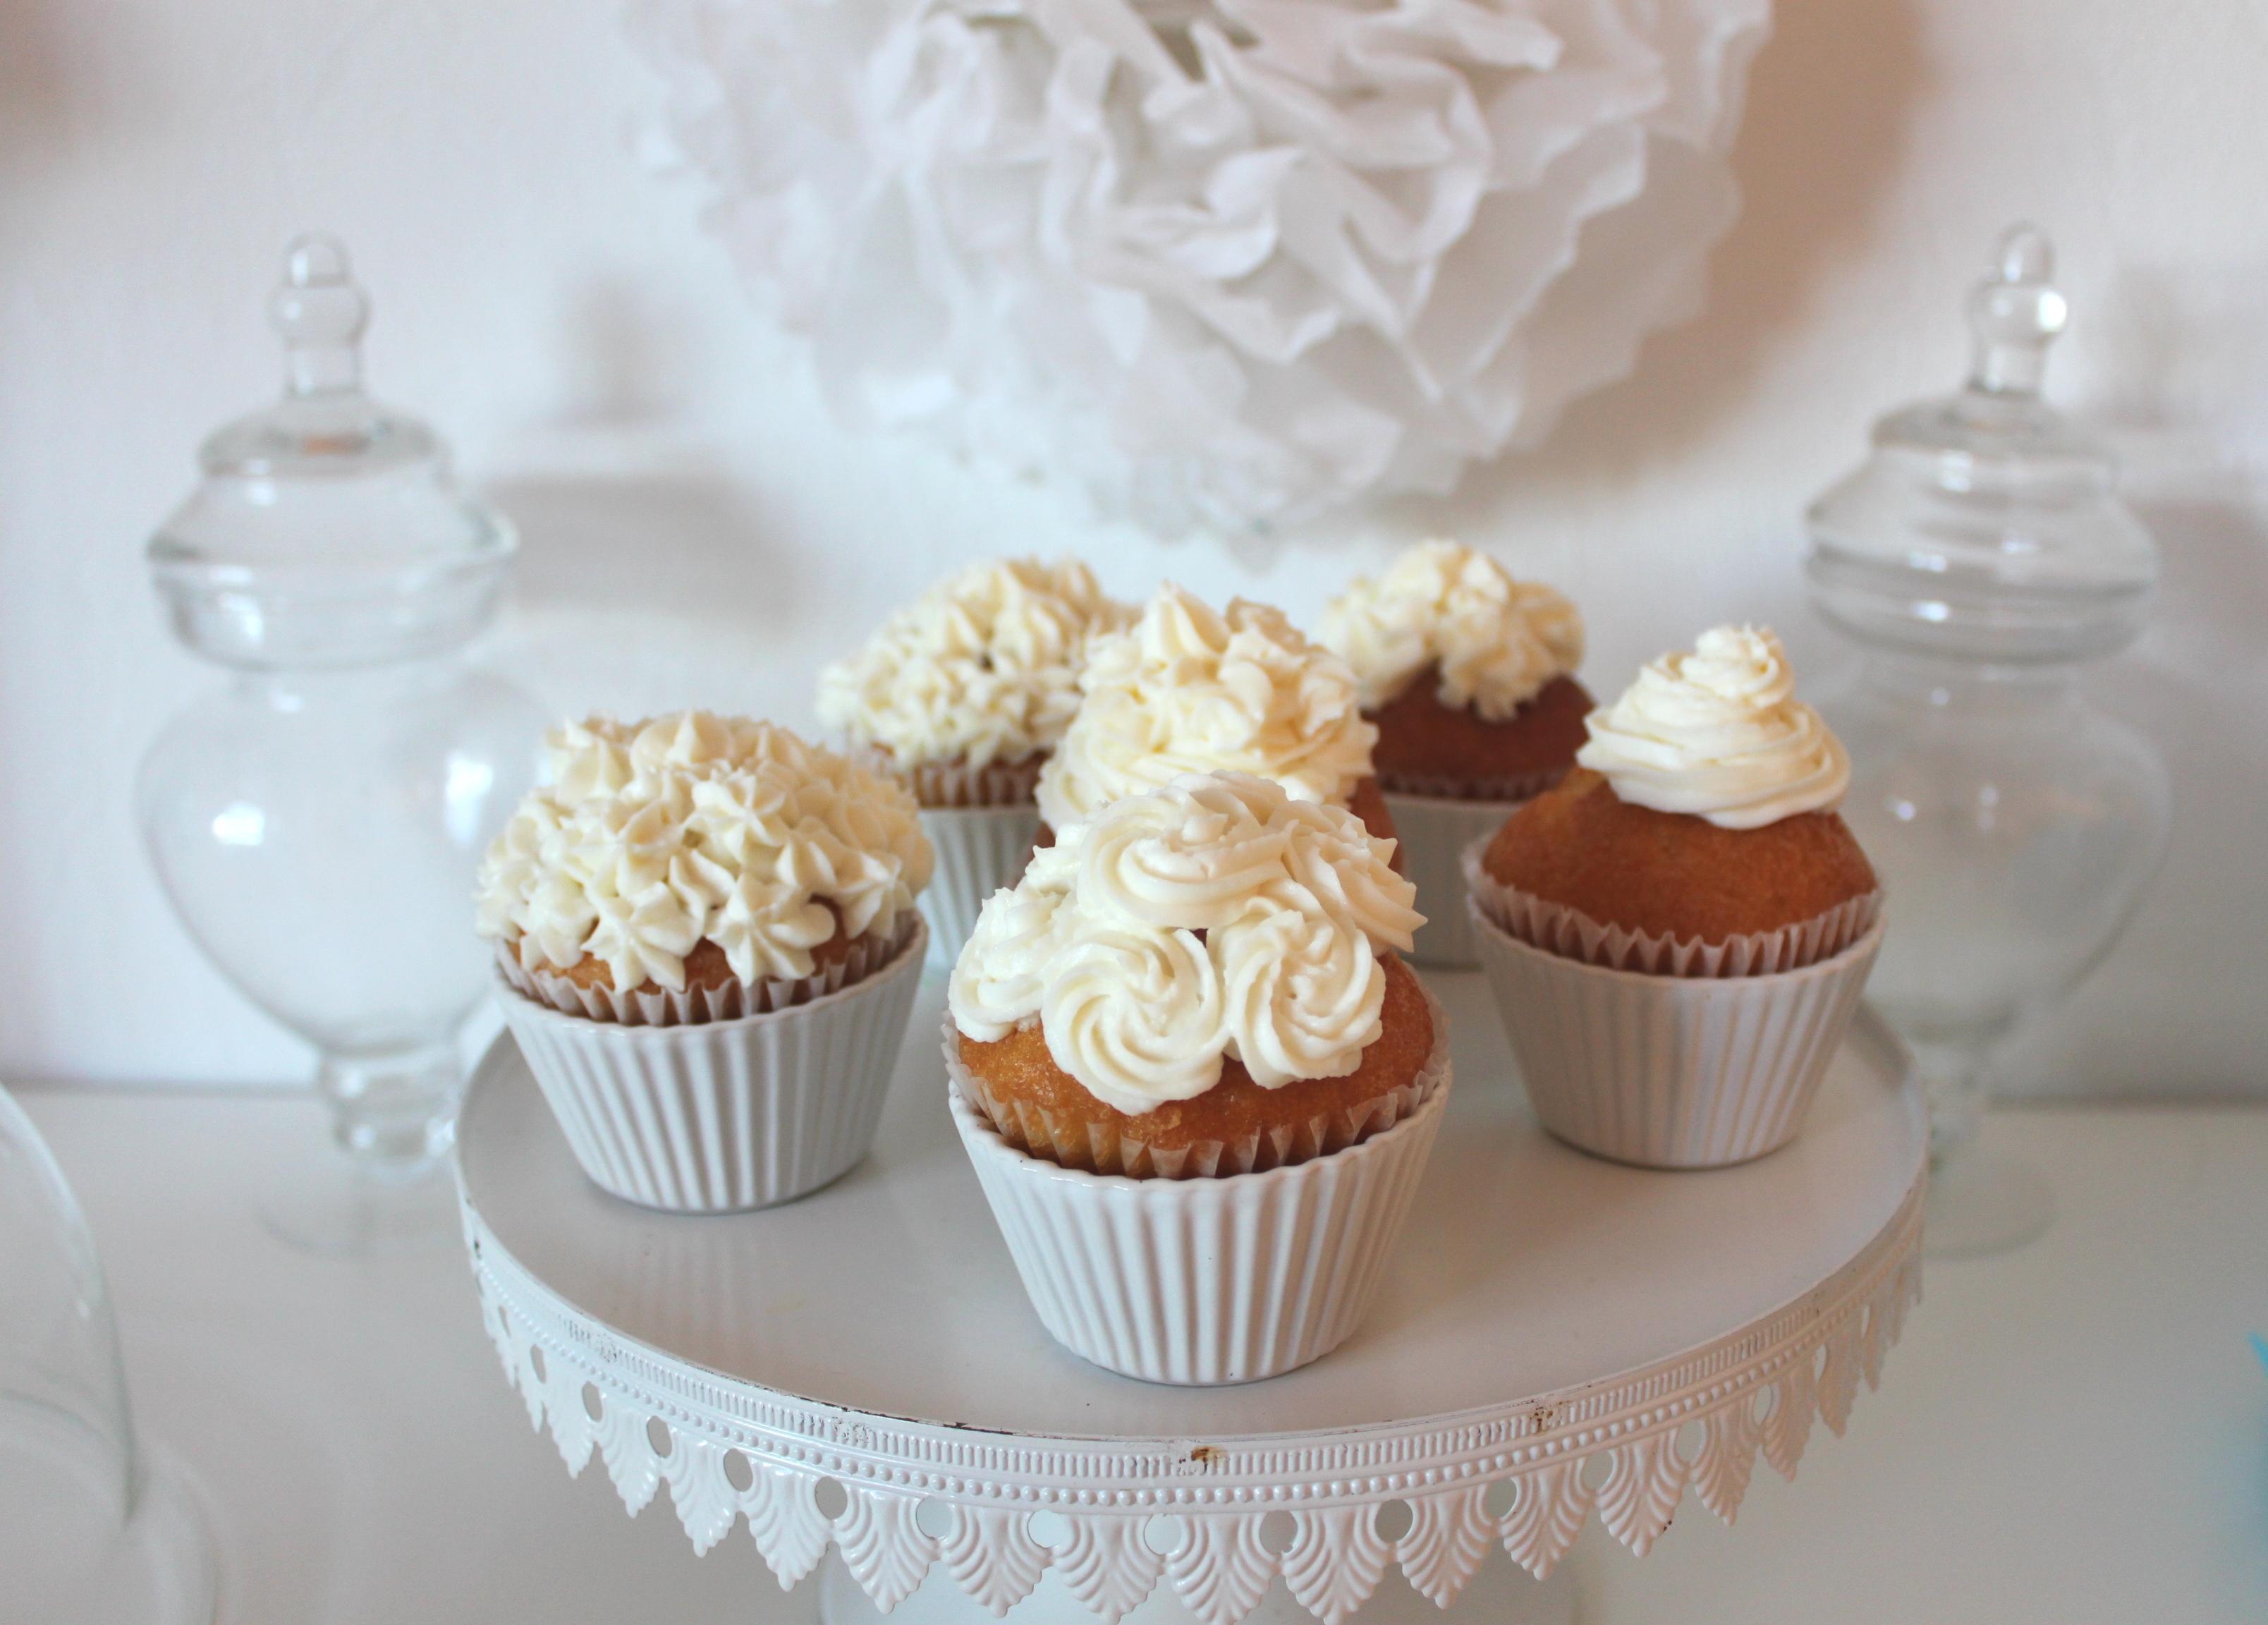 cupcakes blancs pour un mariage la fabricamania. Black Bedroom Furniture Sets. Home Design Ideas